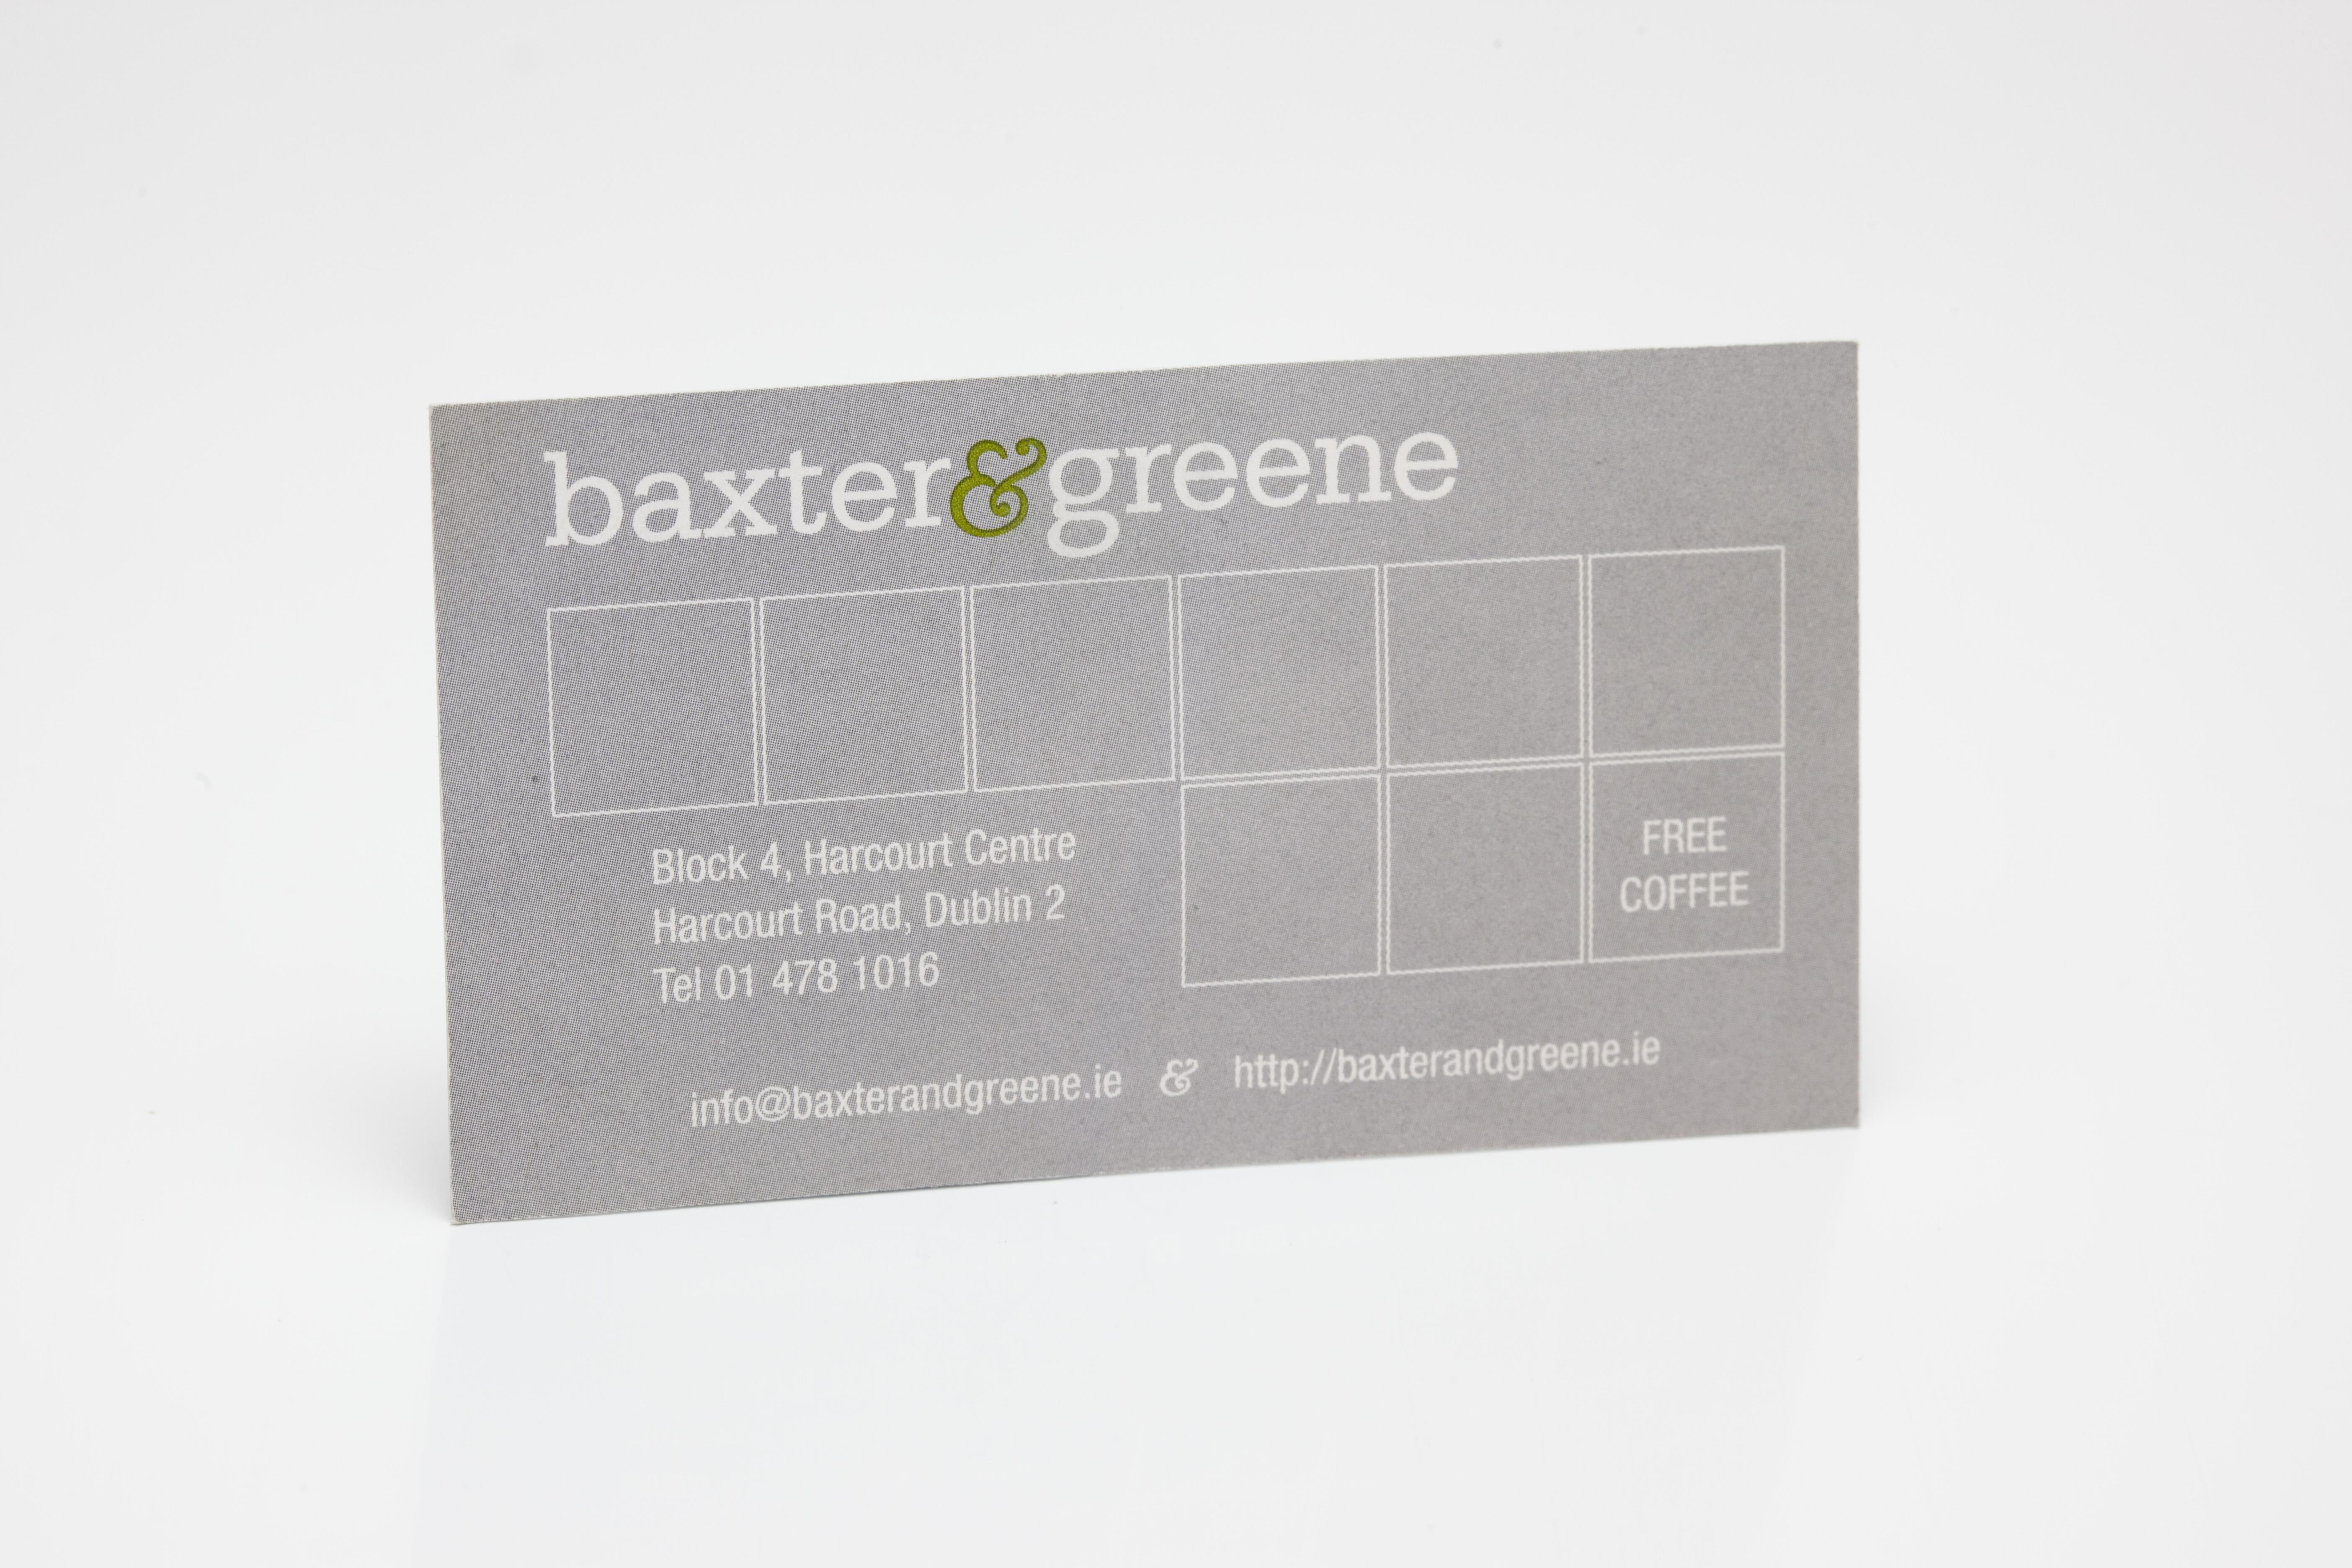 baxter greene business card digital print - Paceprint.ie